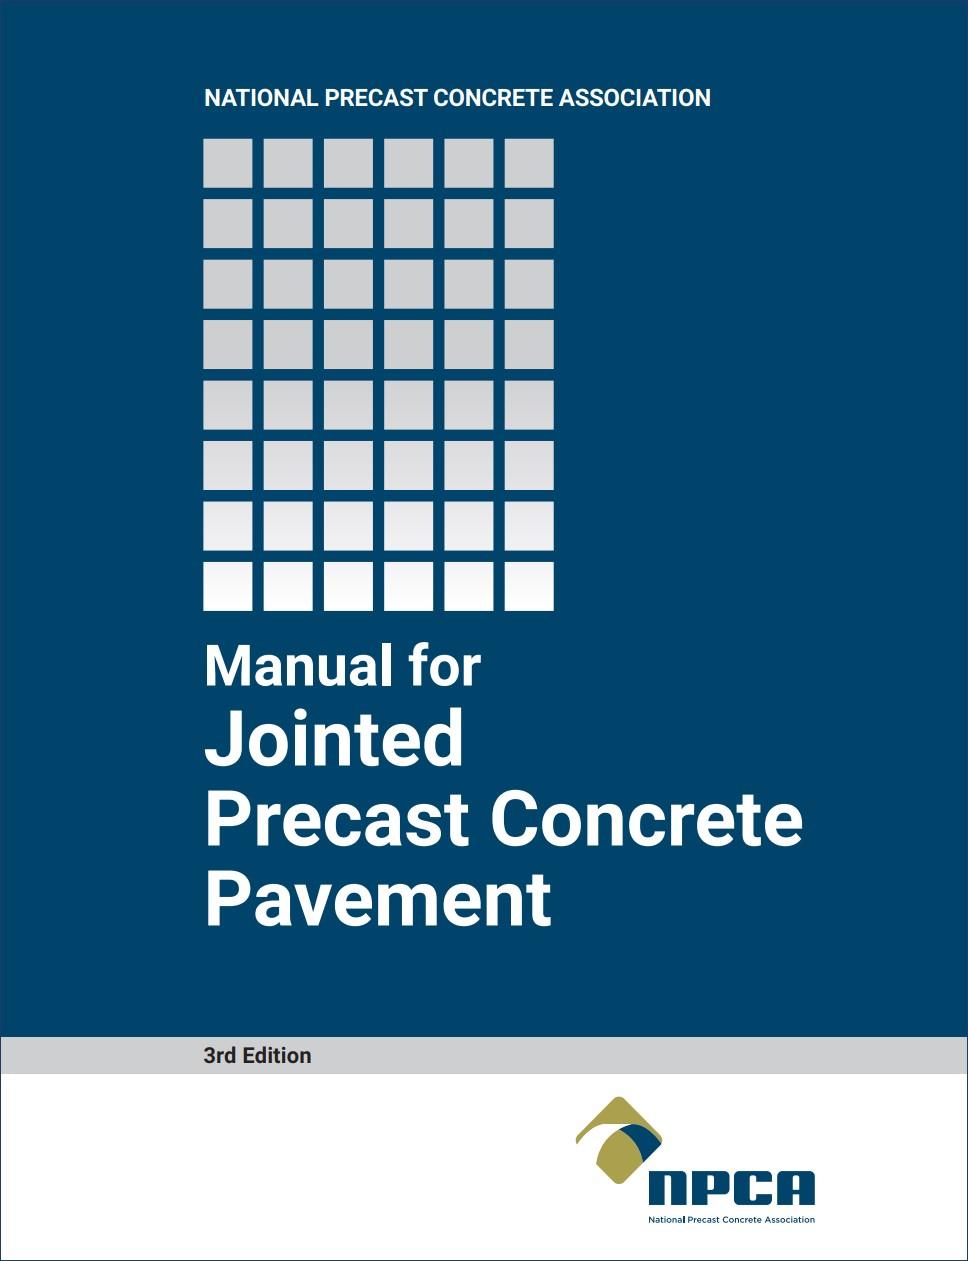 Precast Concrete Pavement